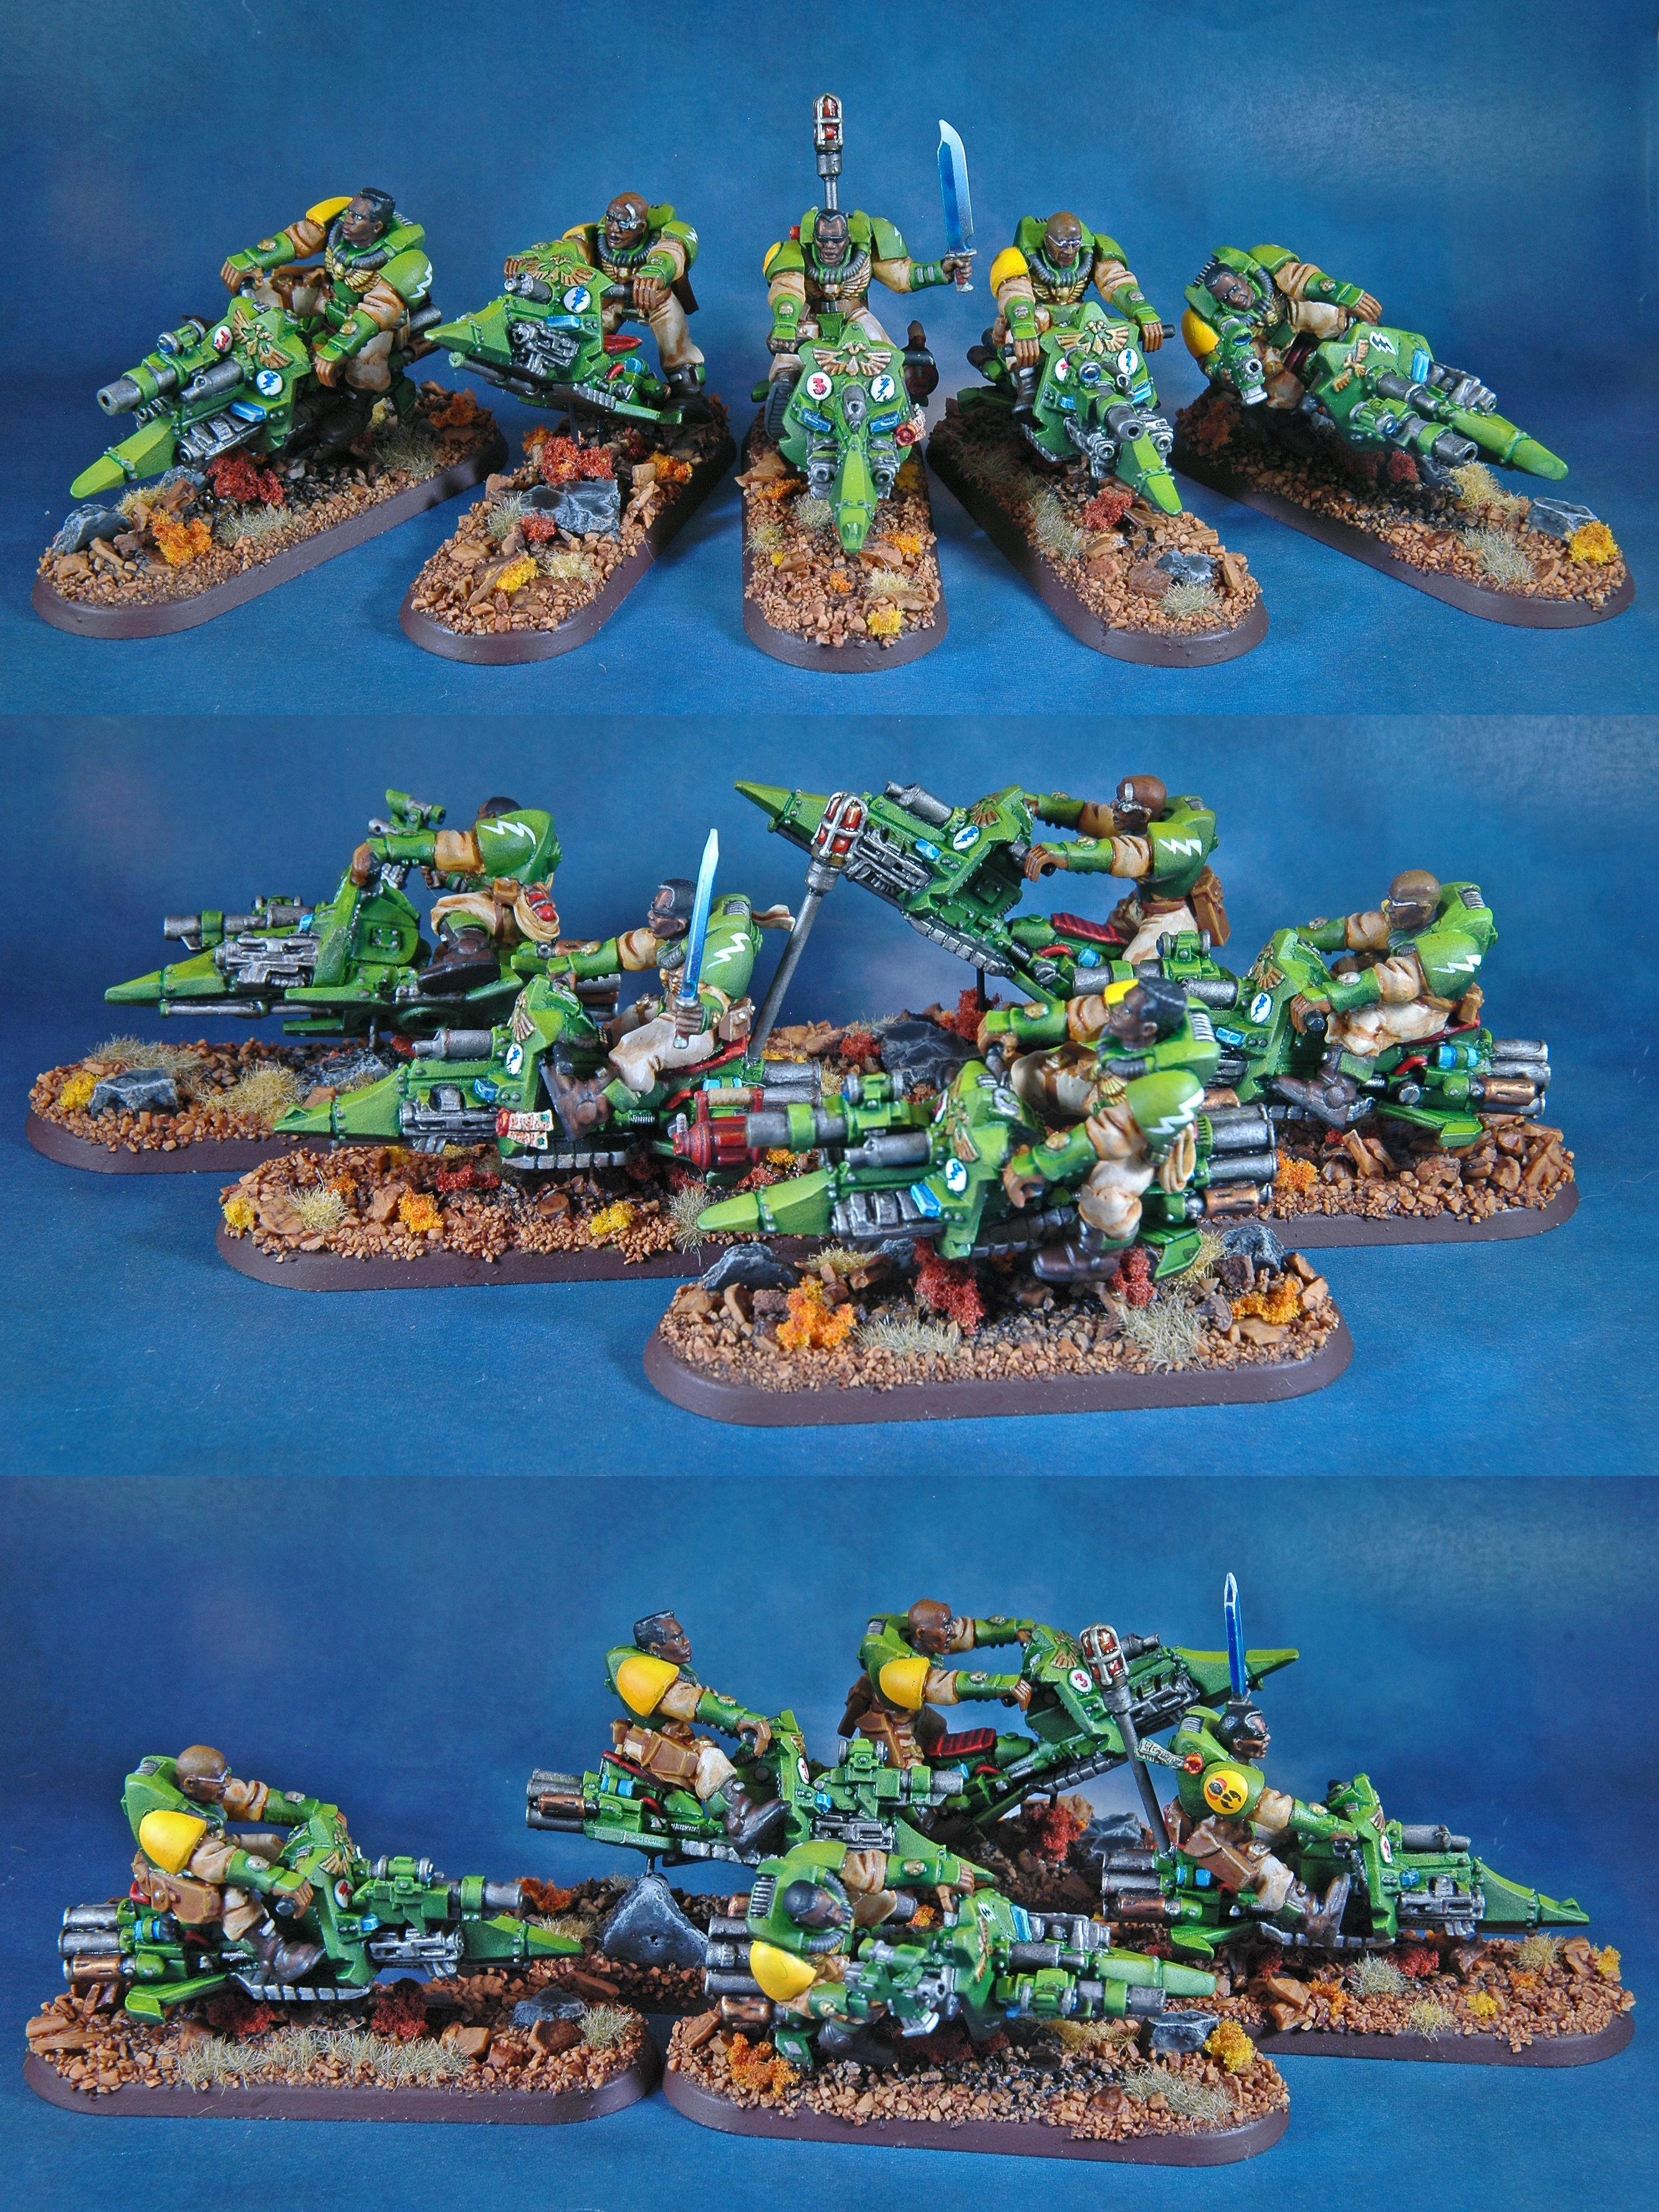 Bike, Jet Bikes, Mantis Warriors, Scouts, Space Marines, Warhammer 40,000